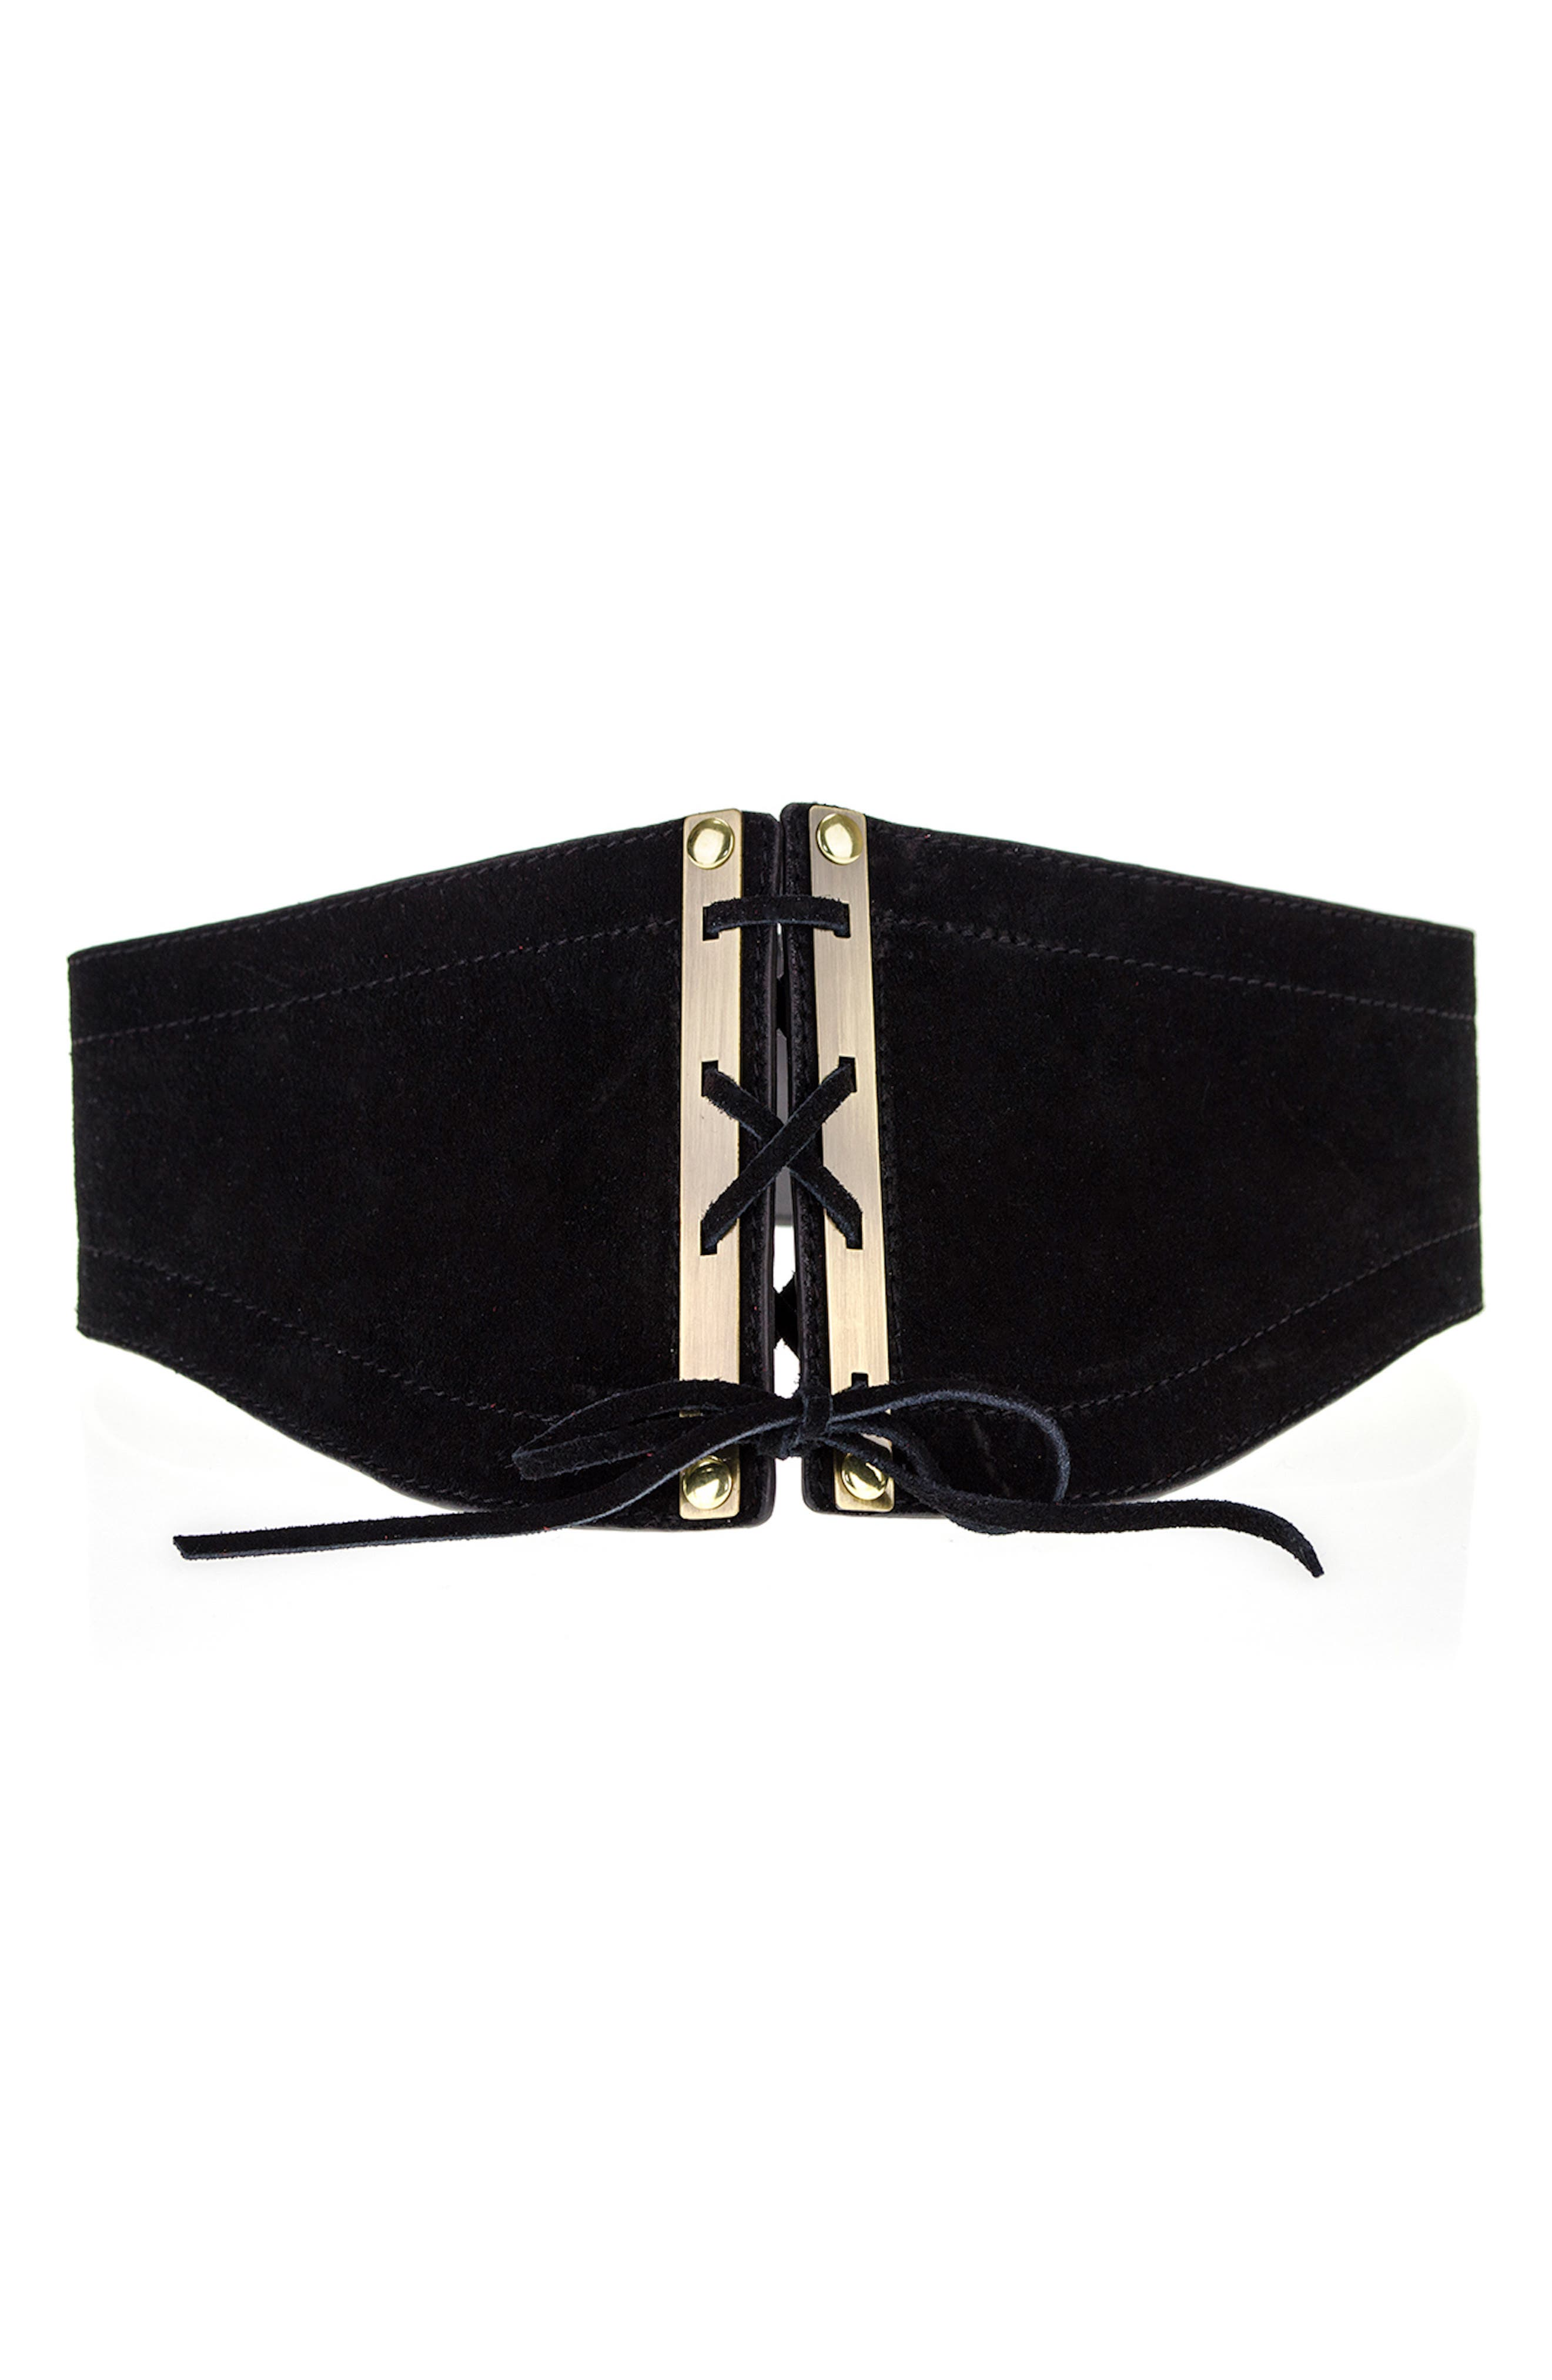 Roxy Corset Belt,                             Main thumbnail 1, color,                             001